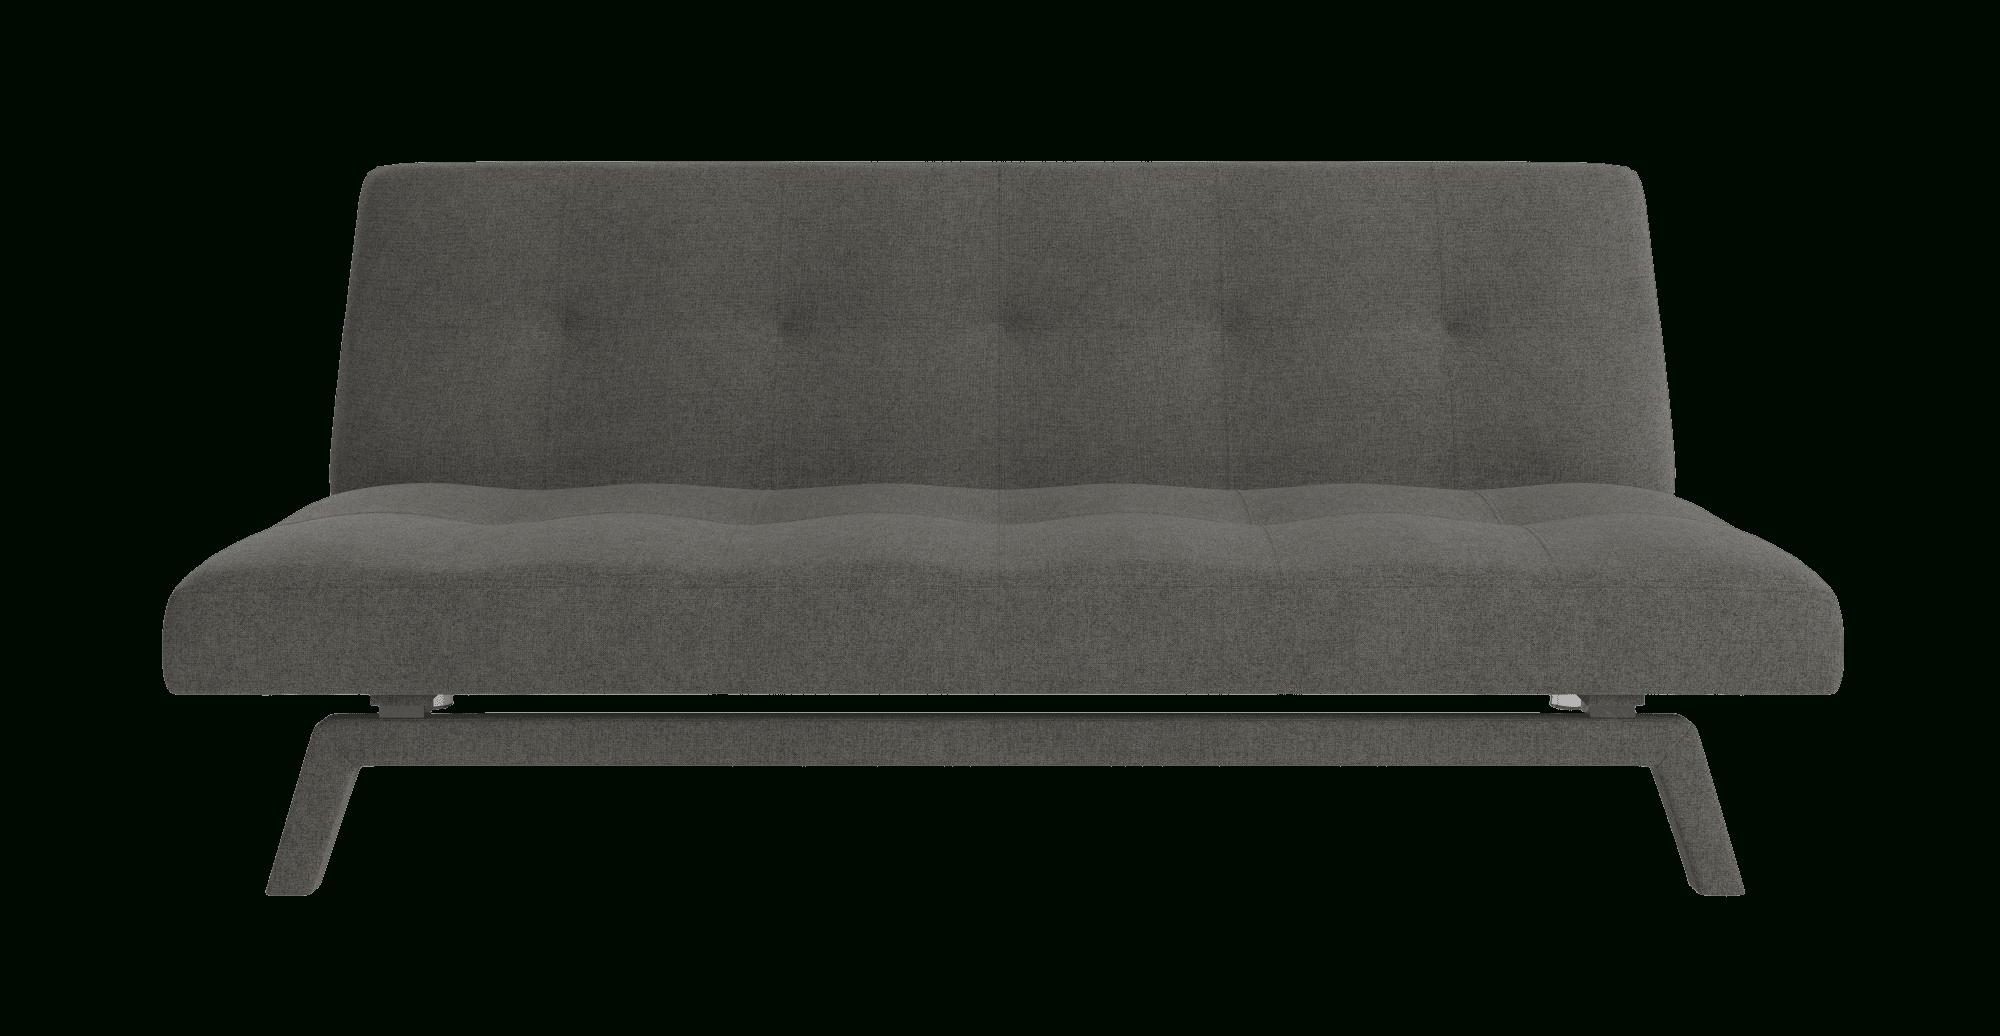 Buy Milo Sofa Bed Online In Australia   Brosa Pertaining To Milo Sofa Chairs (Image 2 of 25)